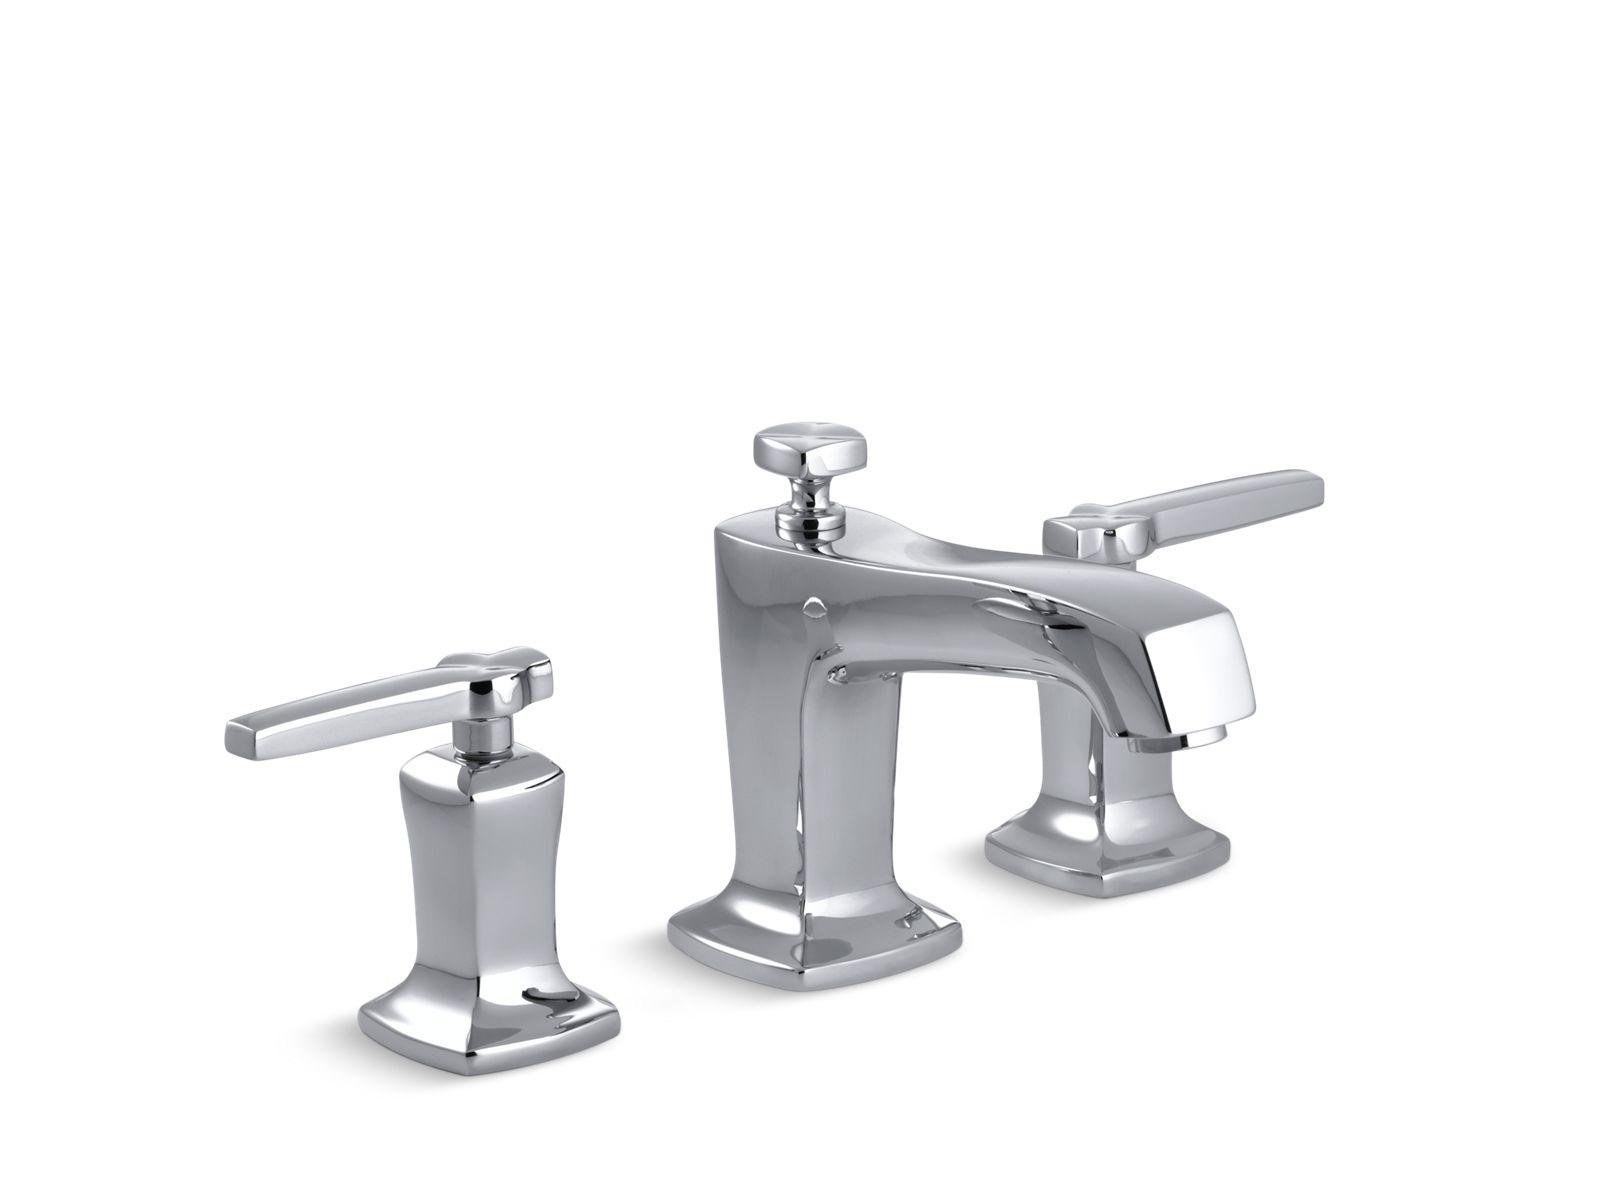 k 16232 4 margaux widespread sink faucet with lever handles kohler